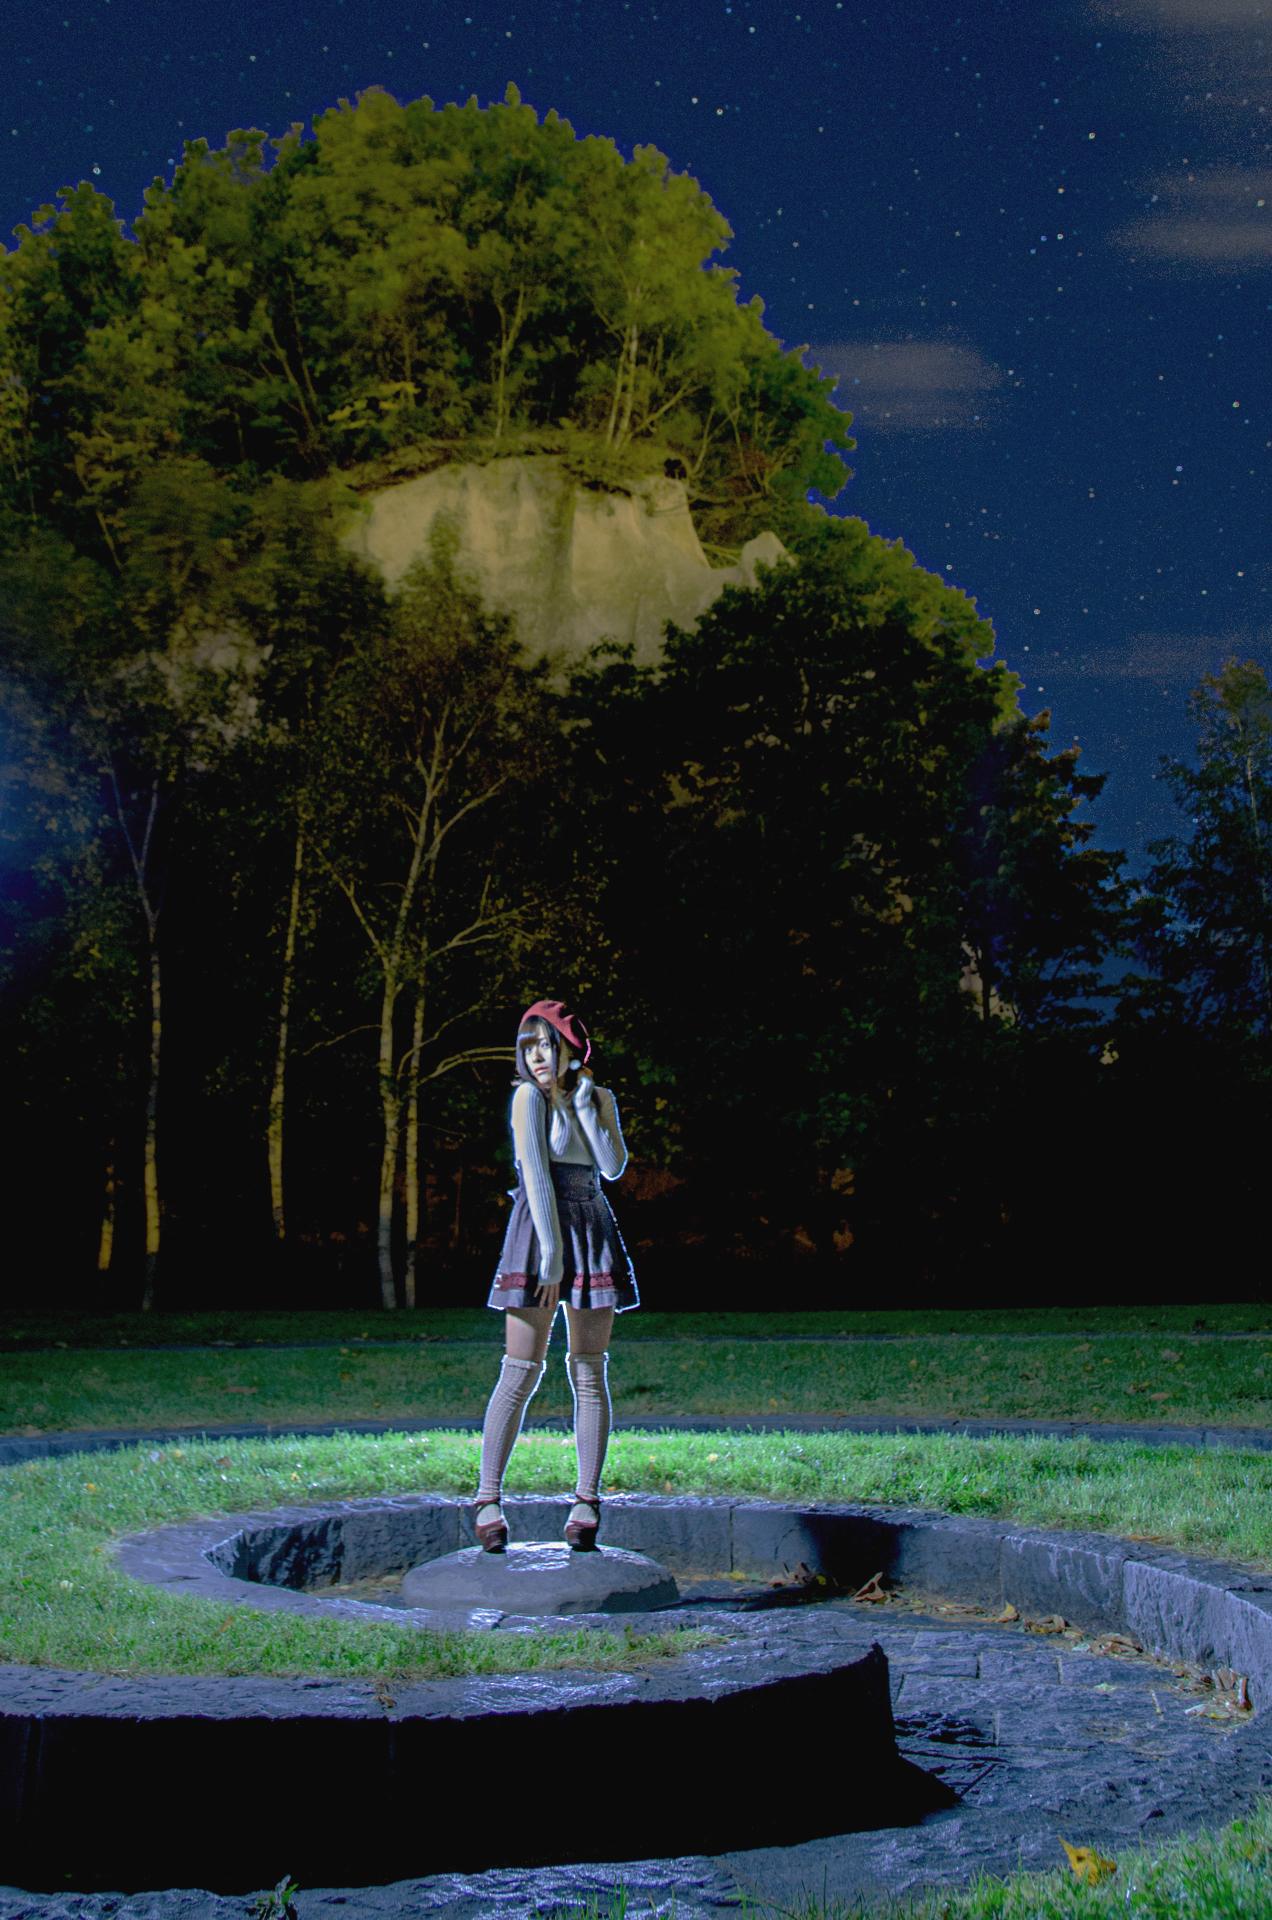 chiaki | 夜景ポートレートにチャレンジ